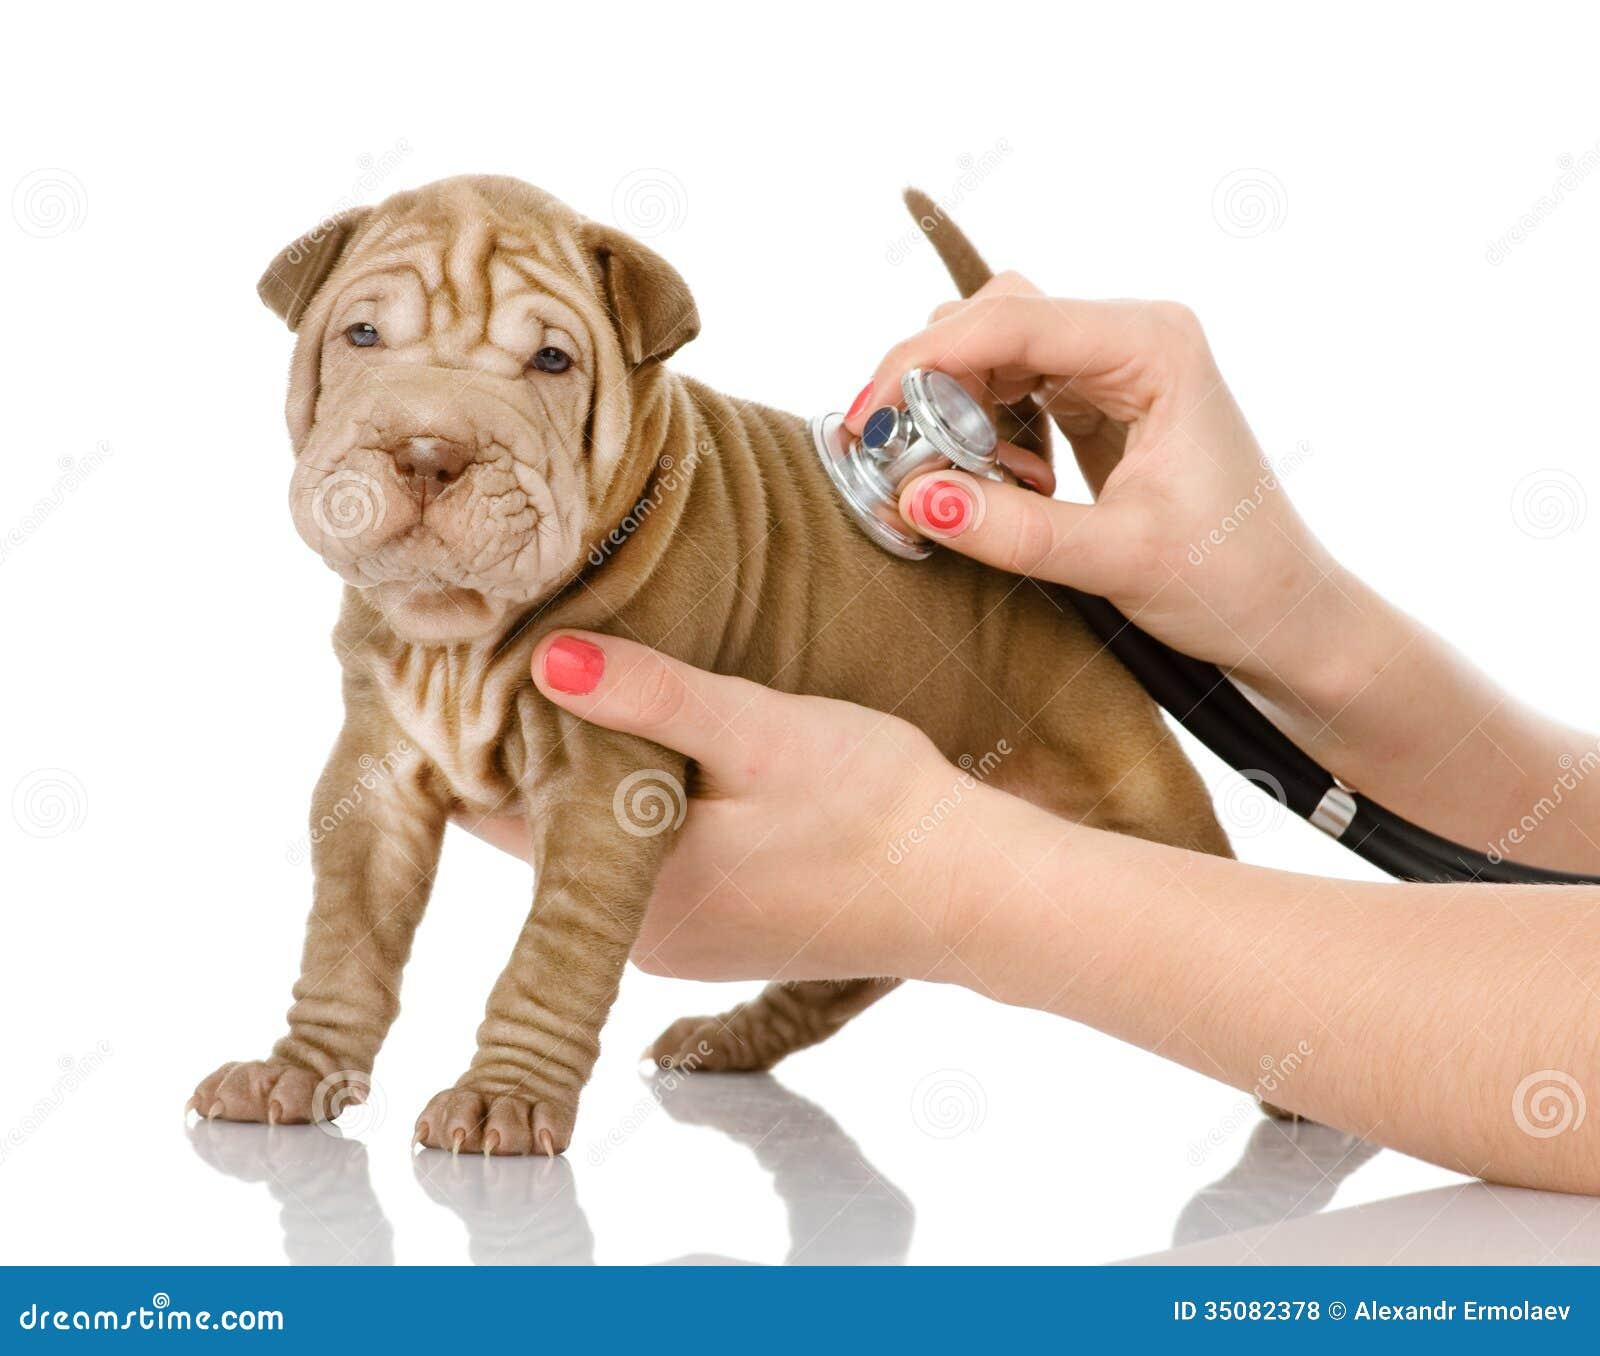 Main vétérinaire examinant un chiot de sharpei